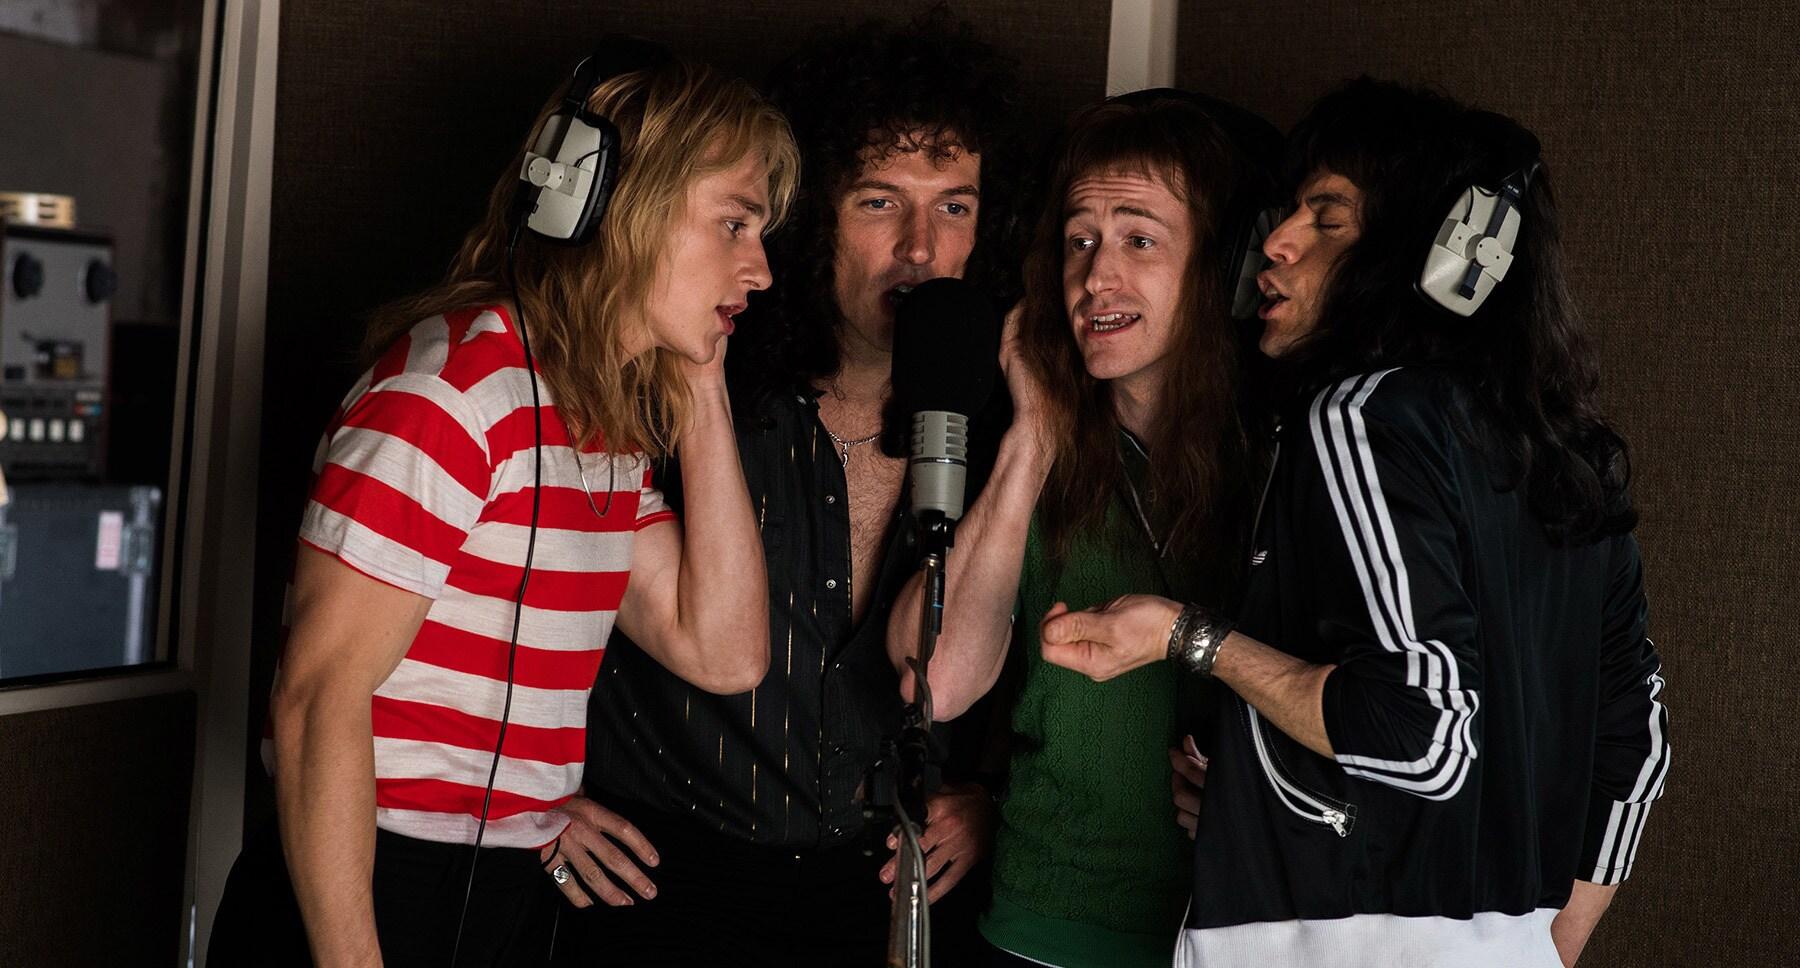 "Rami Malek (as Freddie Mercury) Gwilym Lee (as Brian May), Ben Hardy (as Roger Taylor), and Joseph Mazzello (as John Deacon) singing in the movie ""Bohemian Rhapsody"""